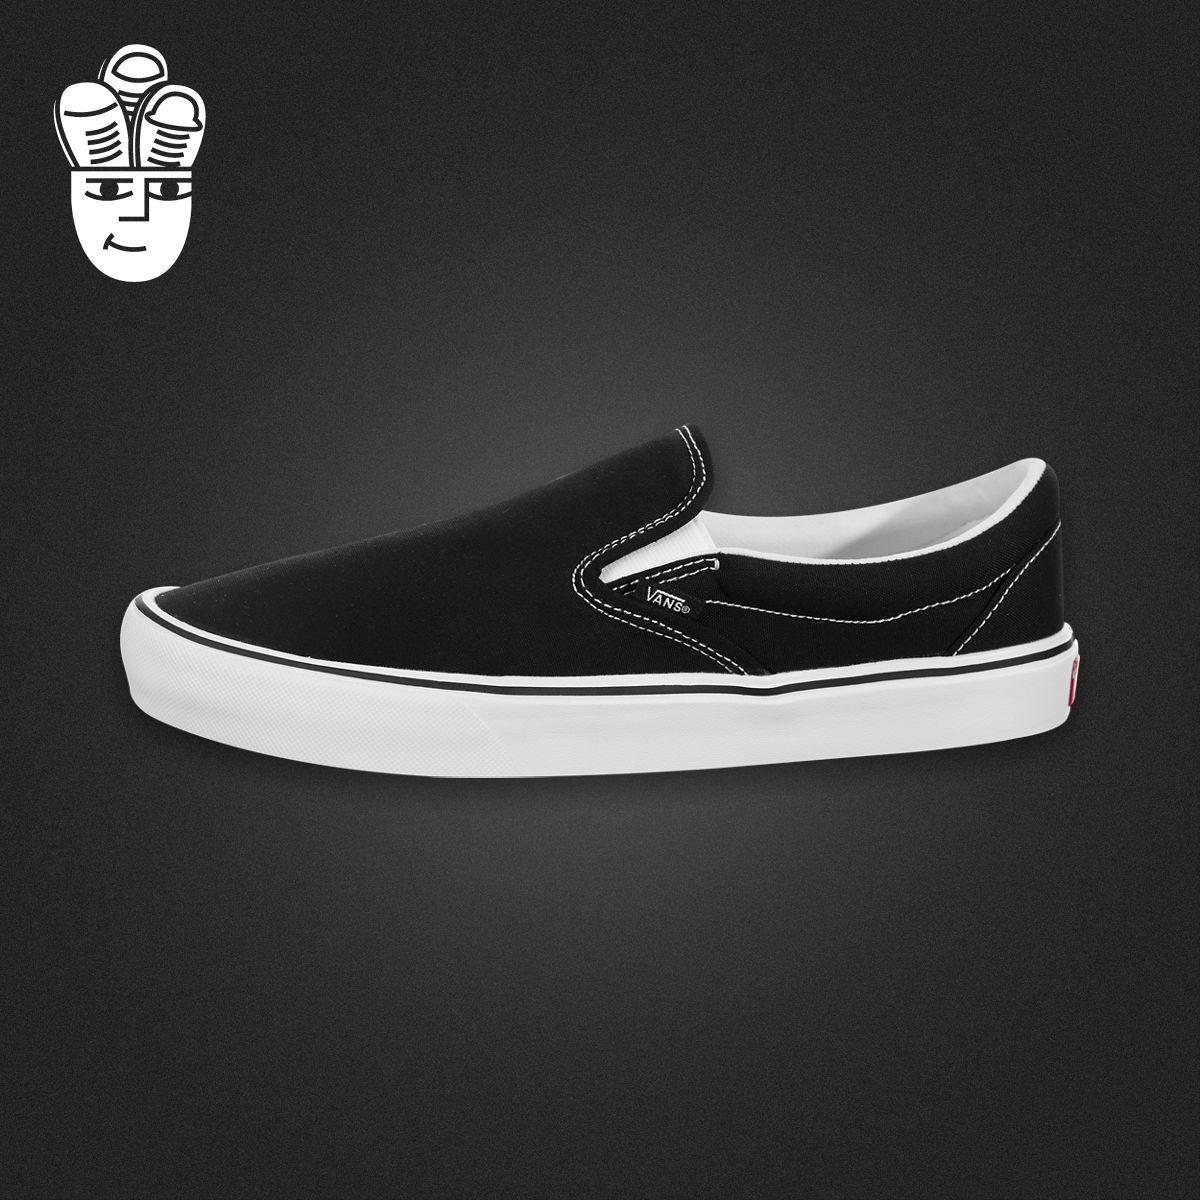 Vans Slip-On Lite 范斯男子休闲板鞋 轻便帆布鞋